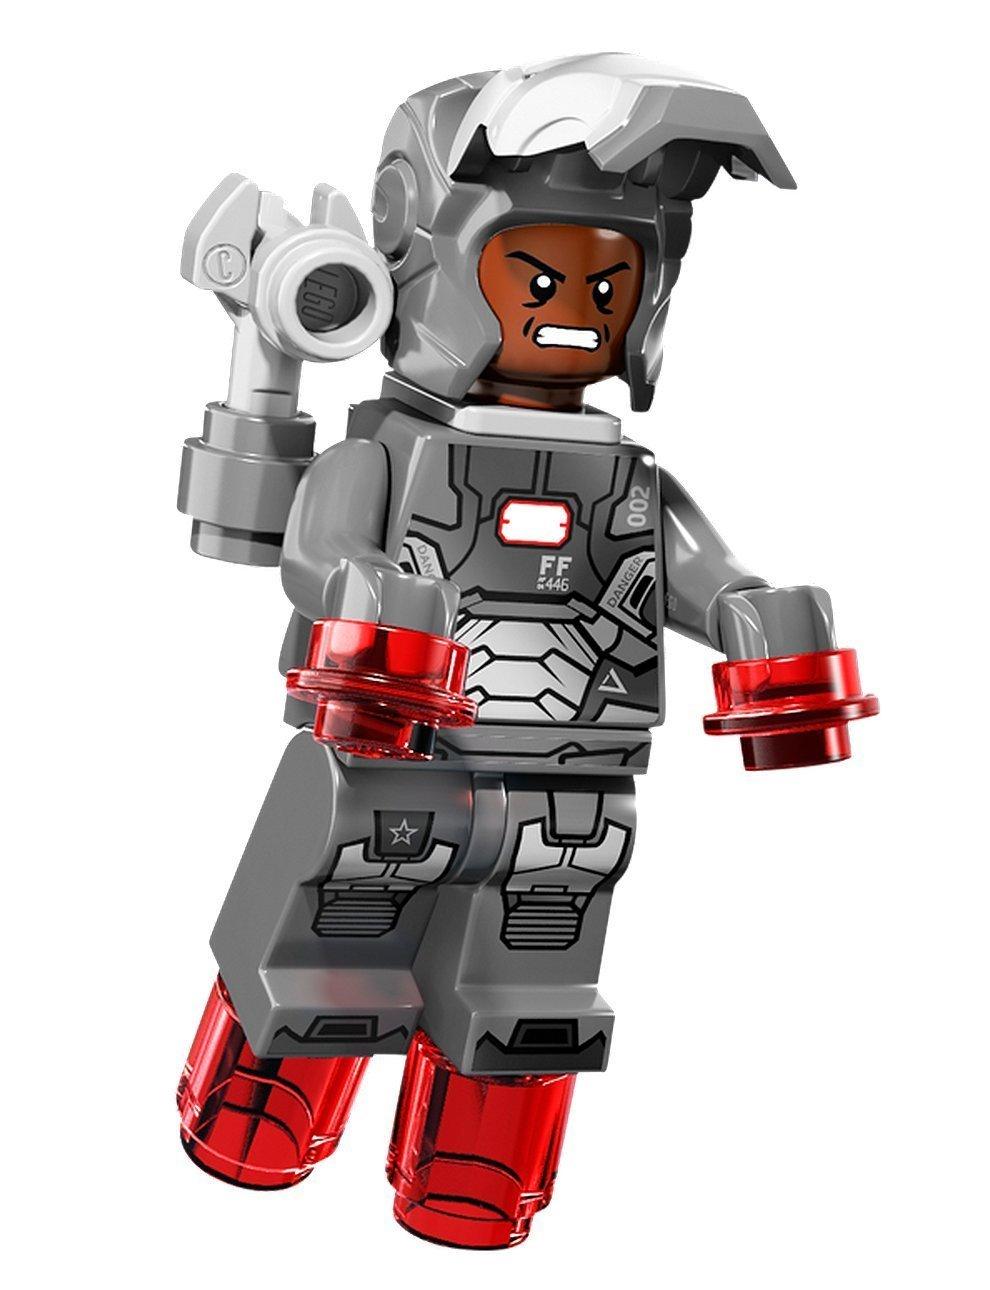 Amazon.com: War Machine LEGO minifigure, from set 76006: Toys & Games